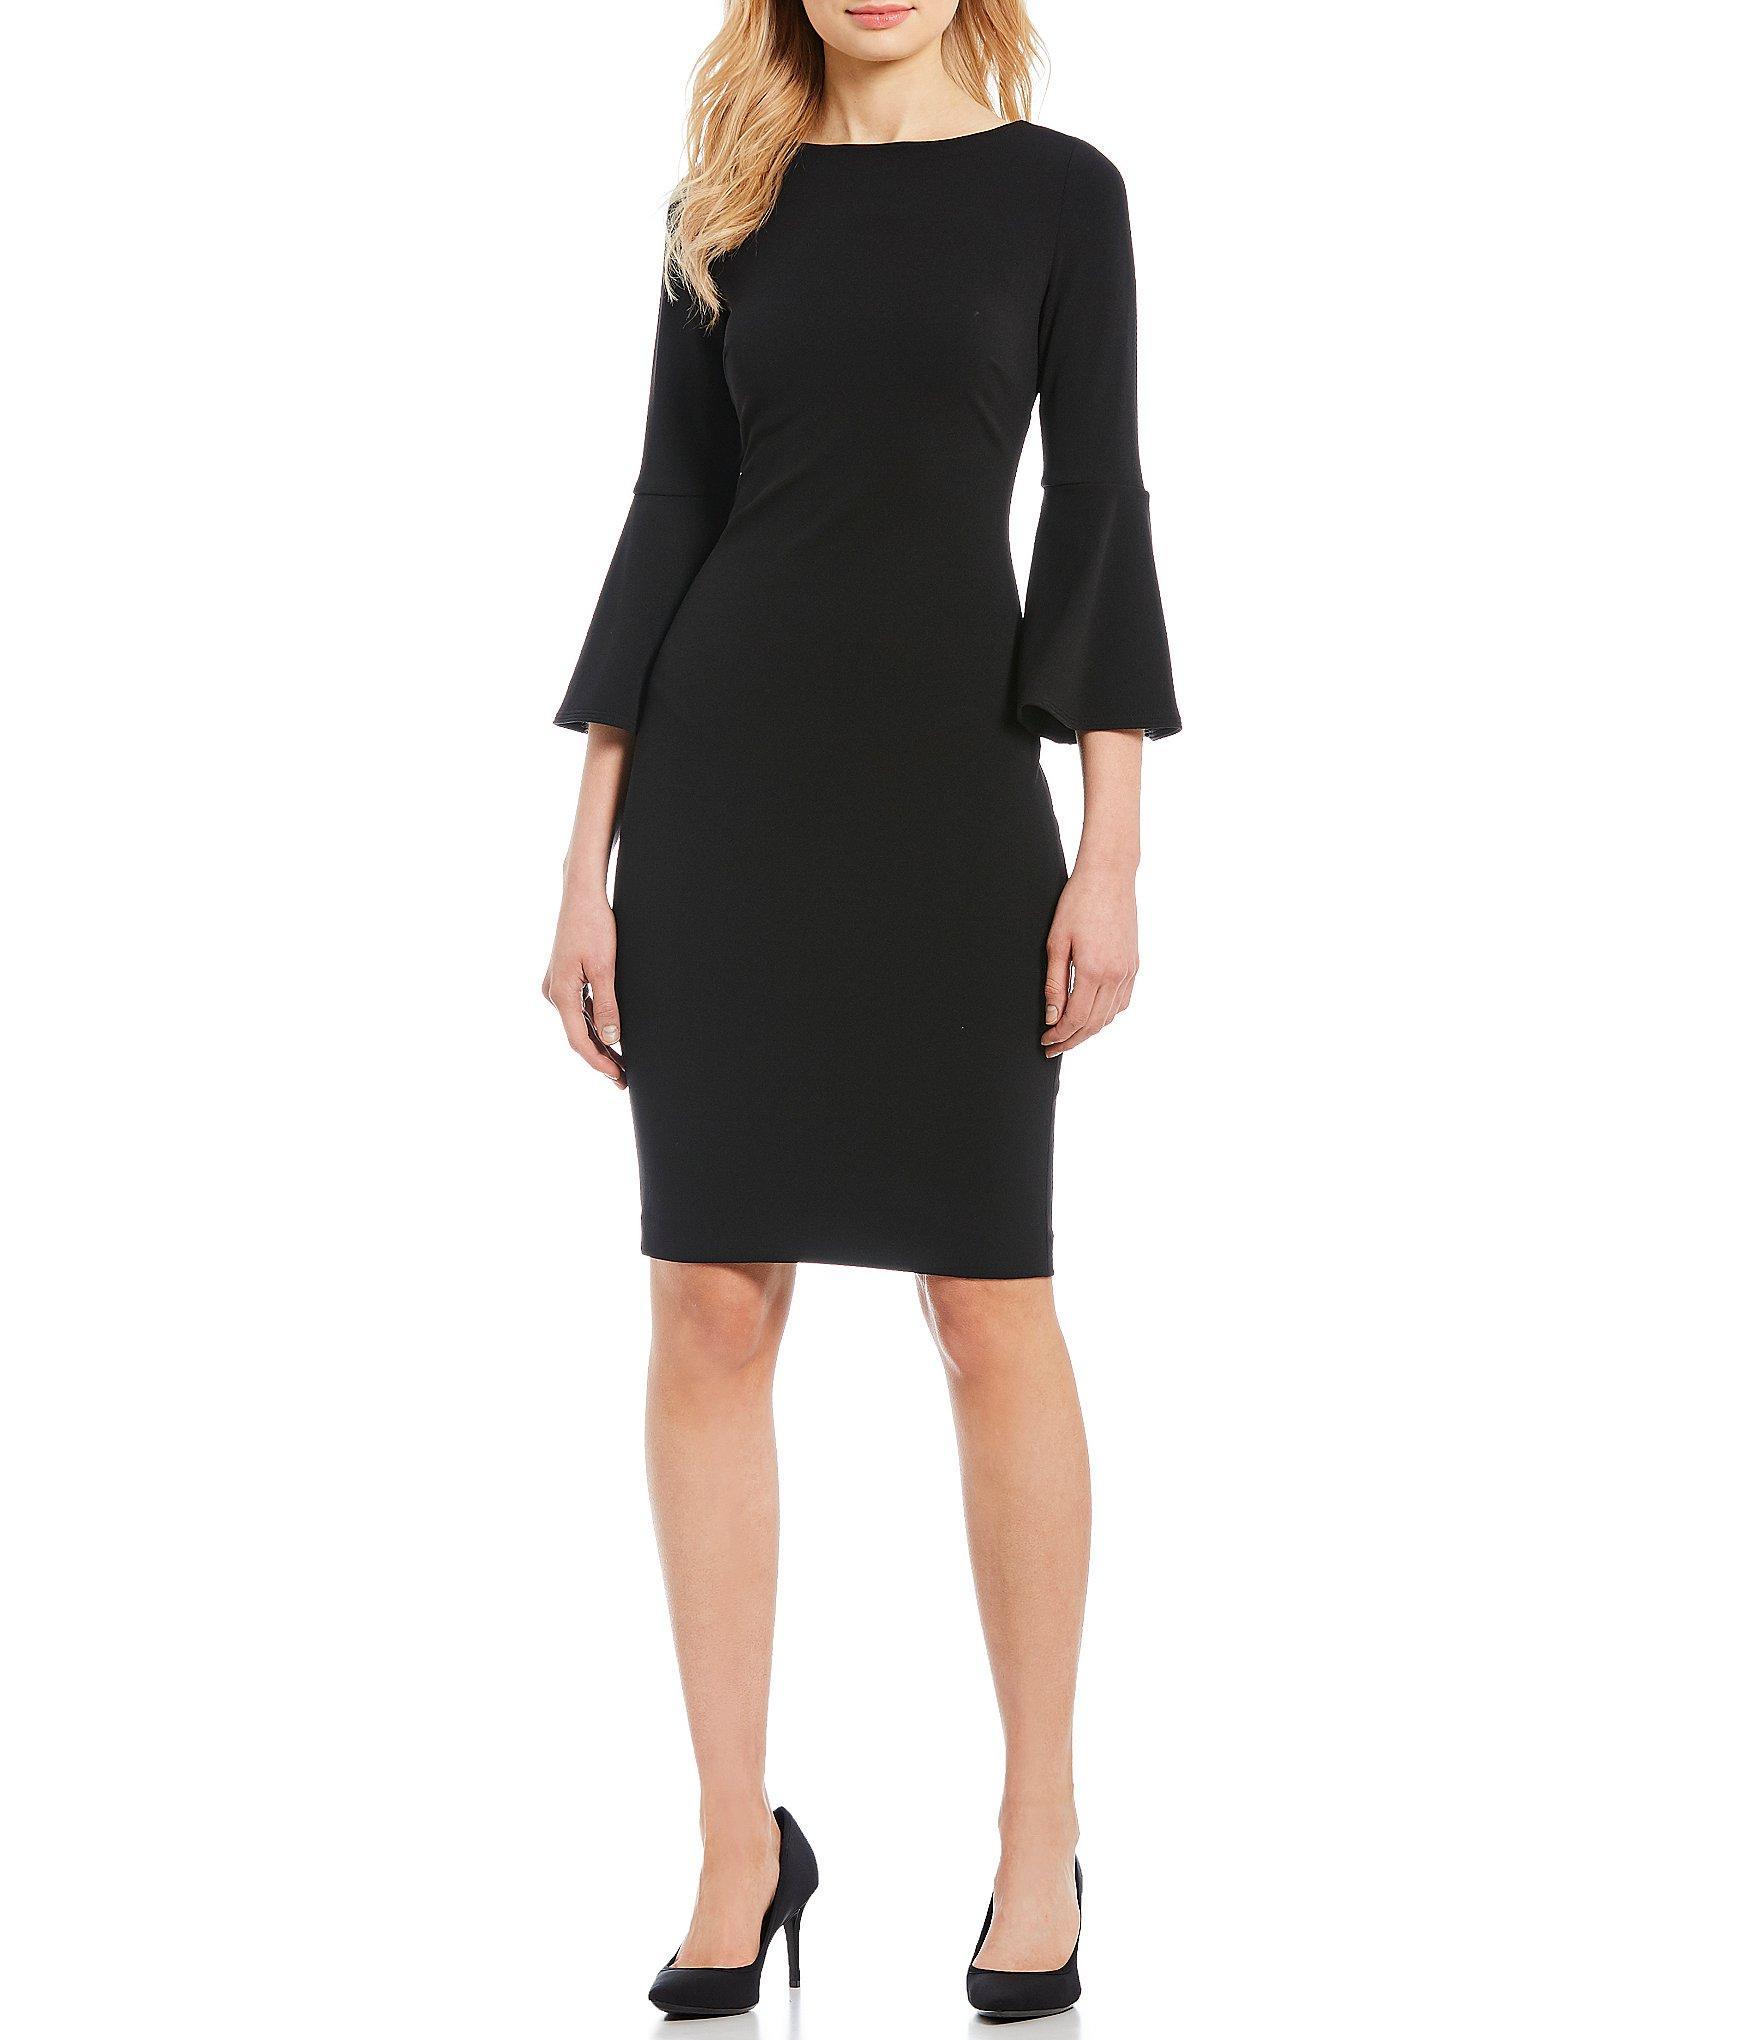 9b495c304a5 Lyst - Calvin Klein Bell-sleeve Sheath Dress in Black - Save 35%